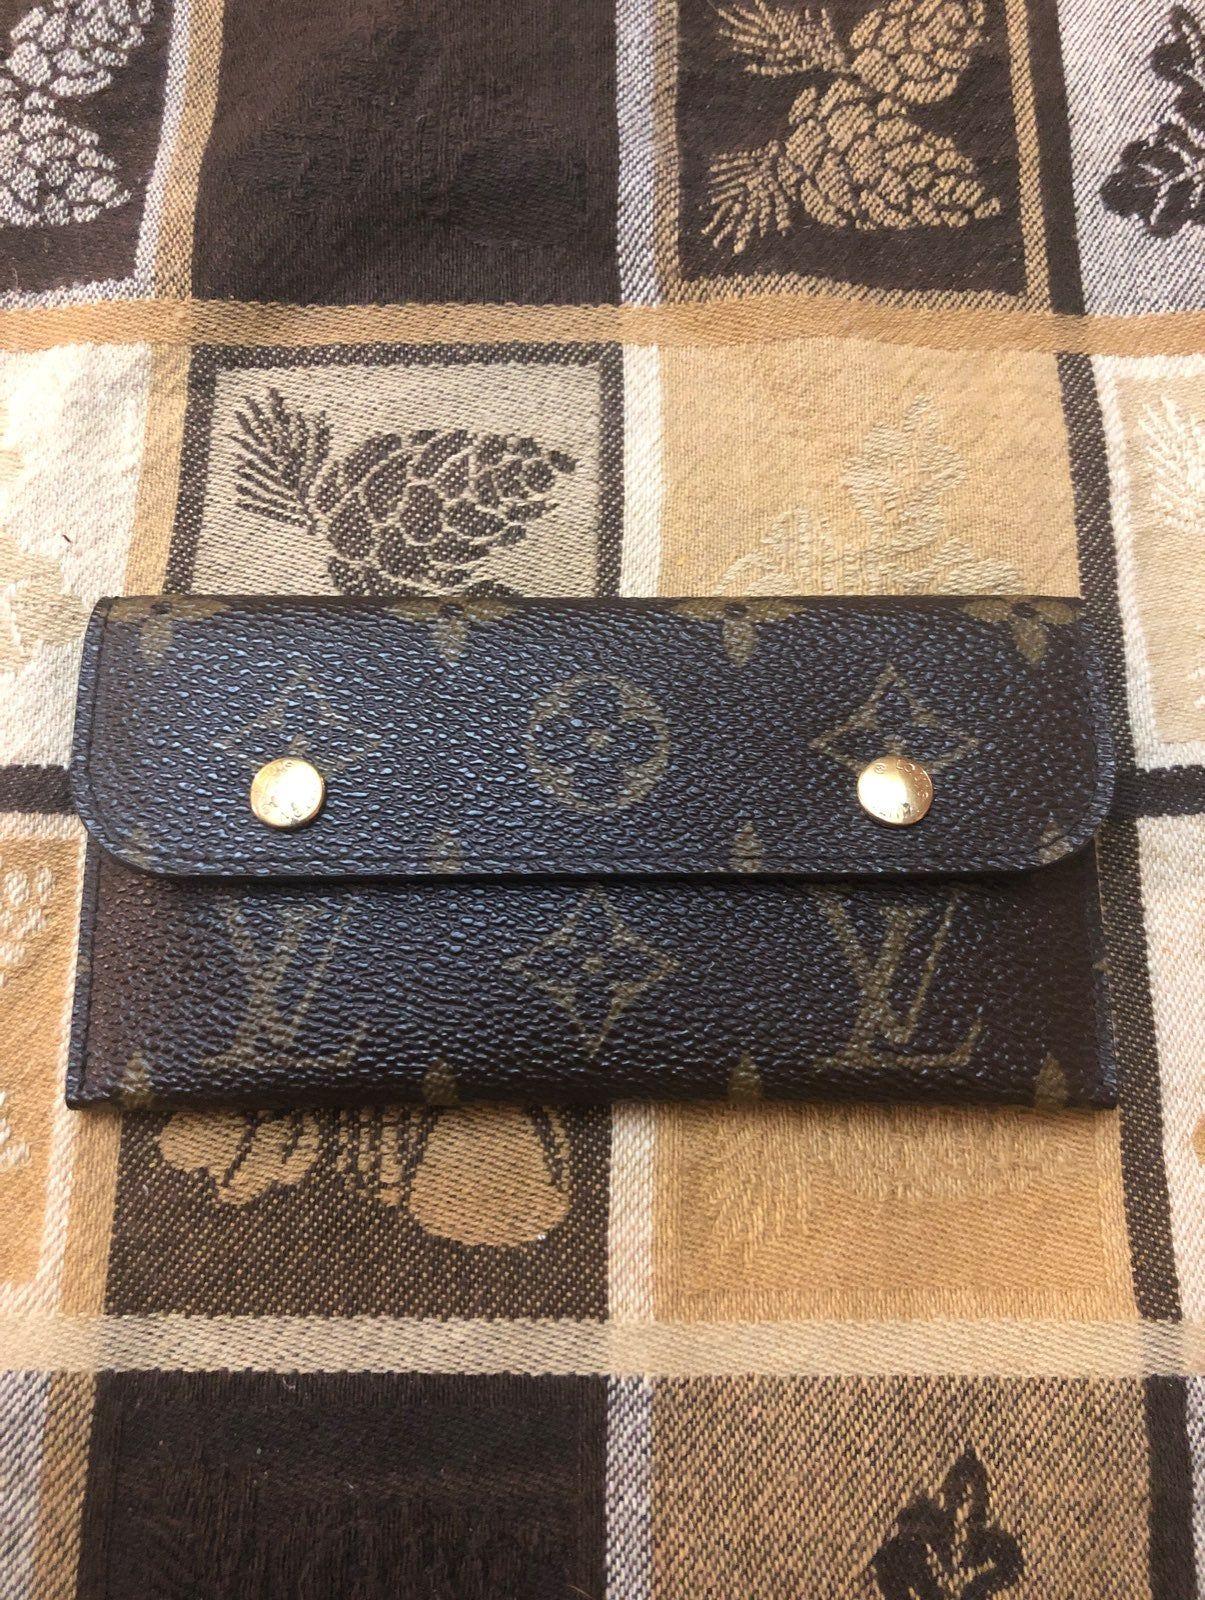 Authentic Louis Vuitton cardcase wallet missing keychain